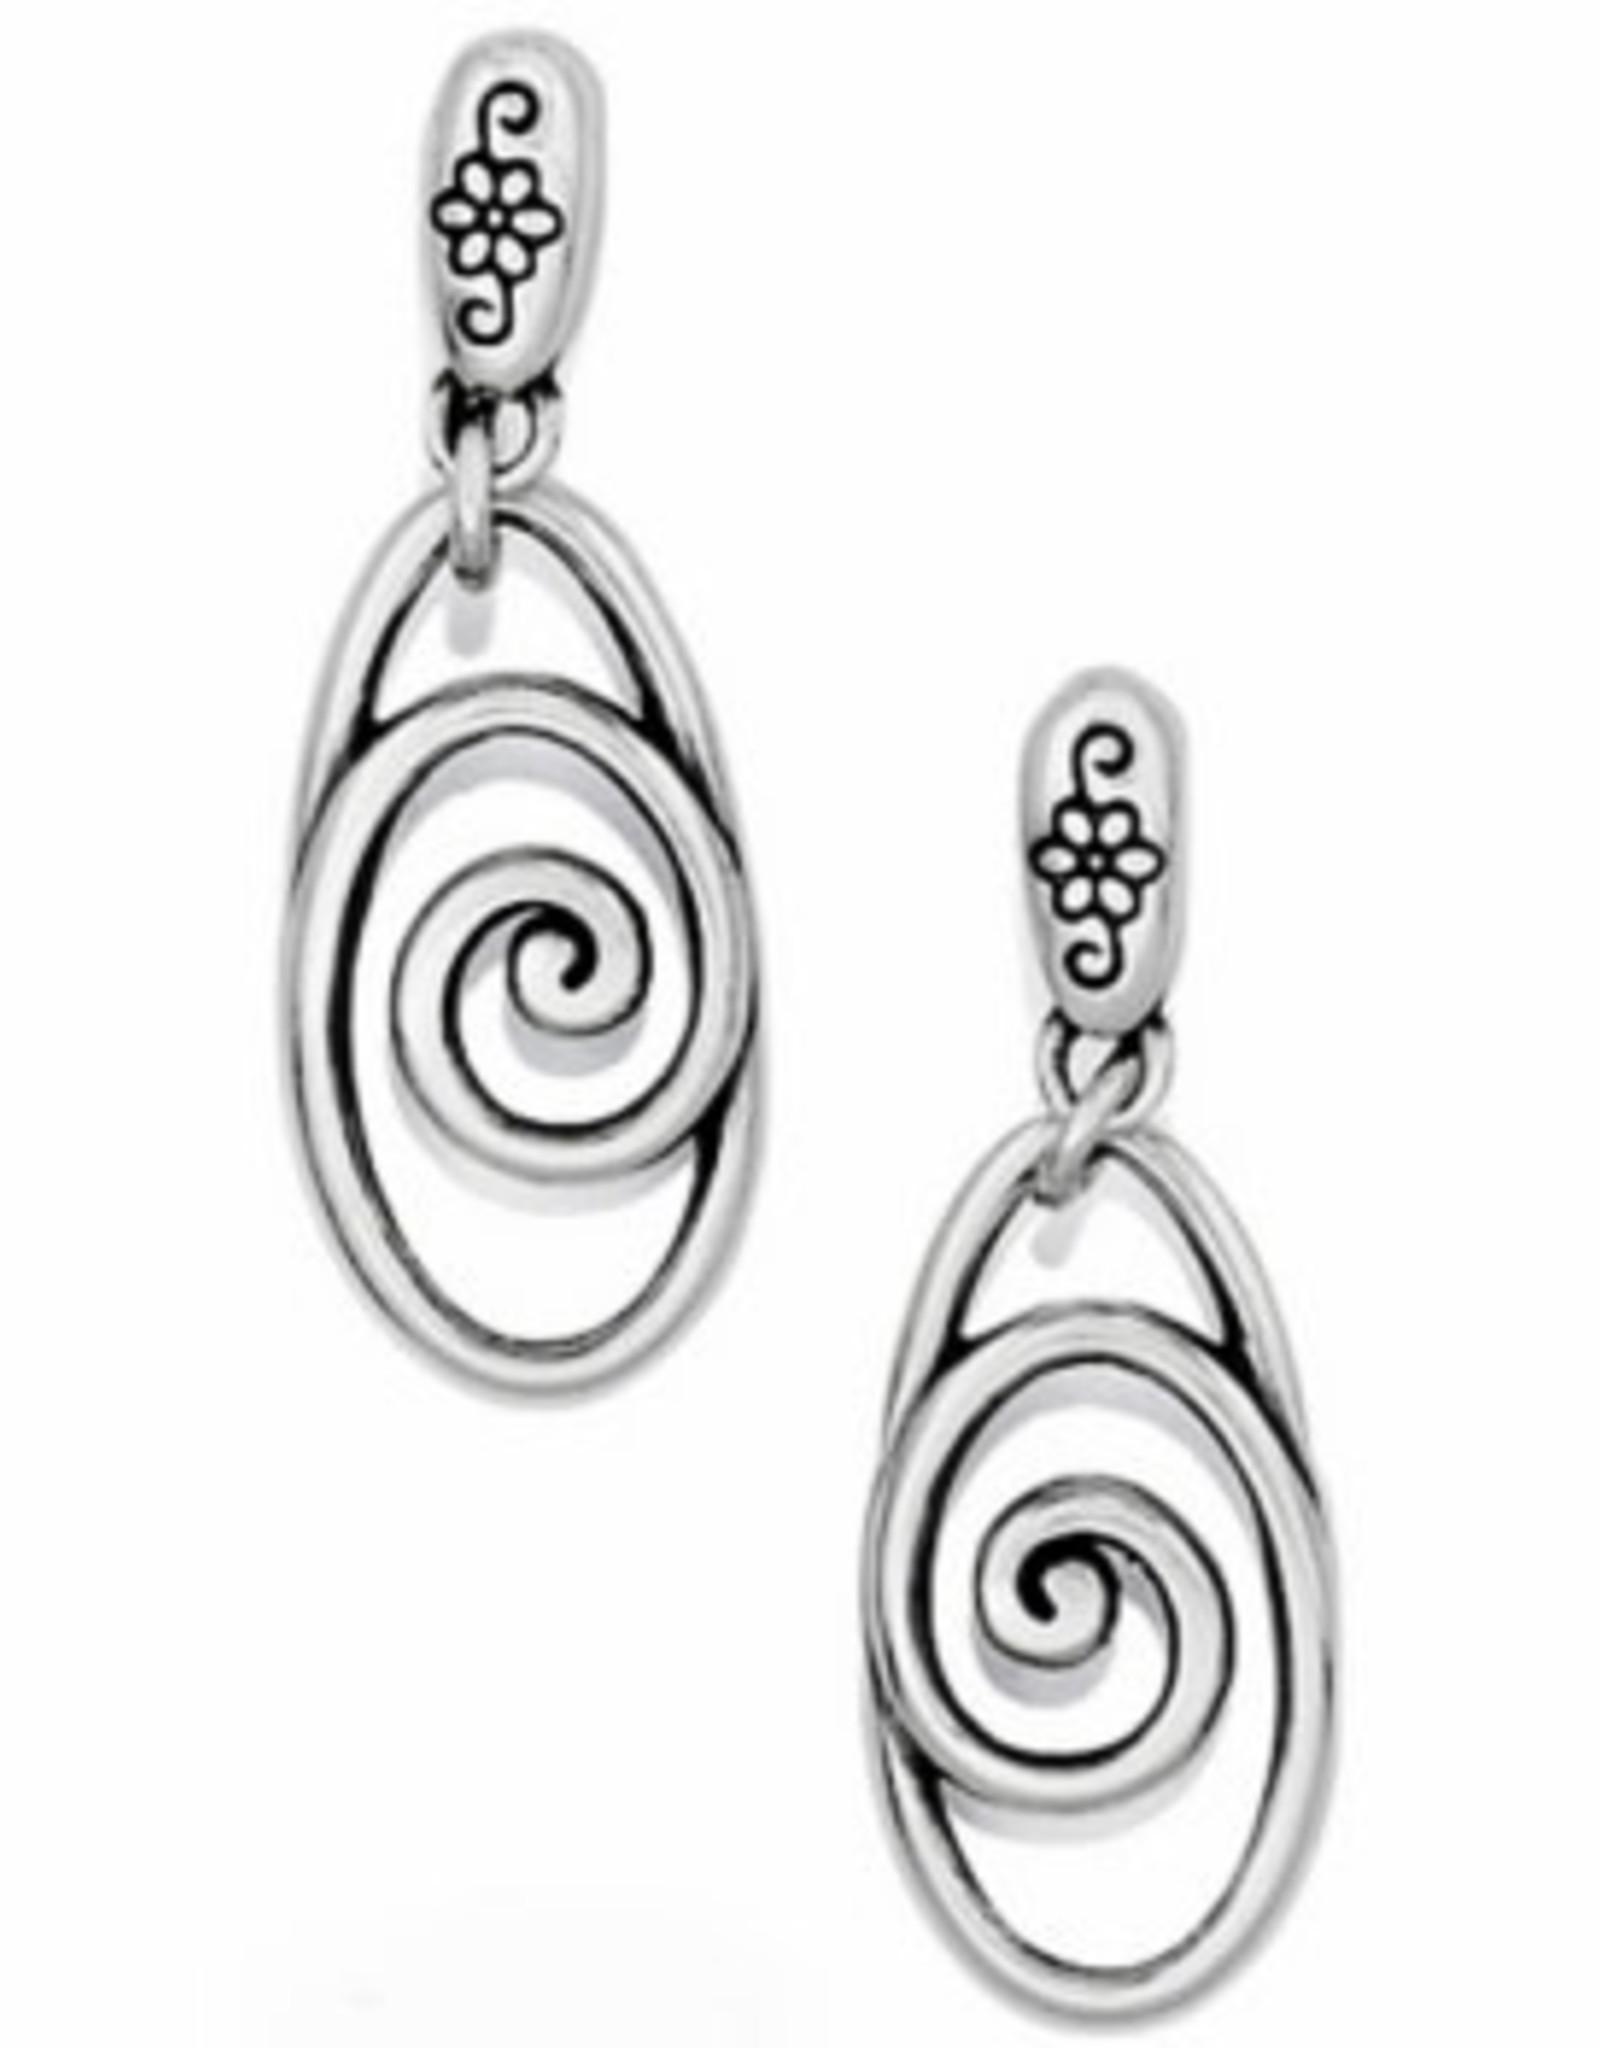 Brighton Brighton, Rock N Scroll Post Drop Earrings silver